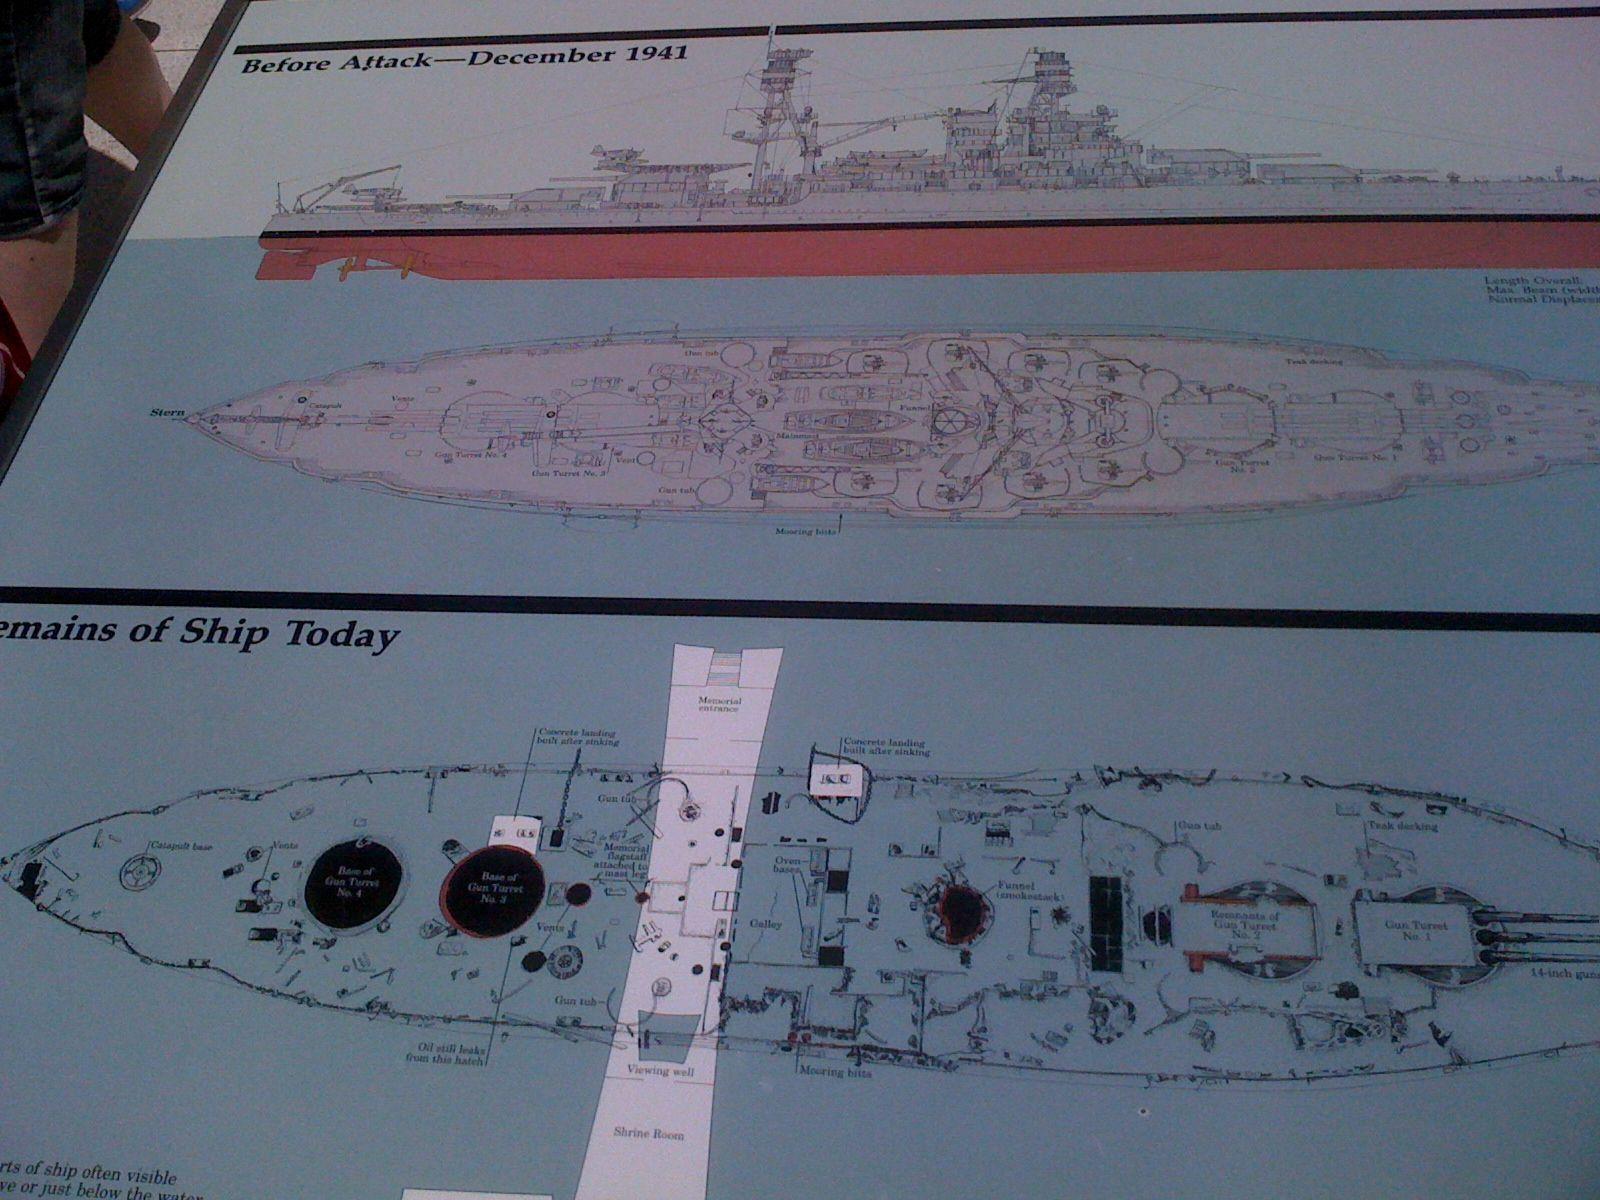 USS Arizona Diagram Uss arizona memorial, Uss arizona